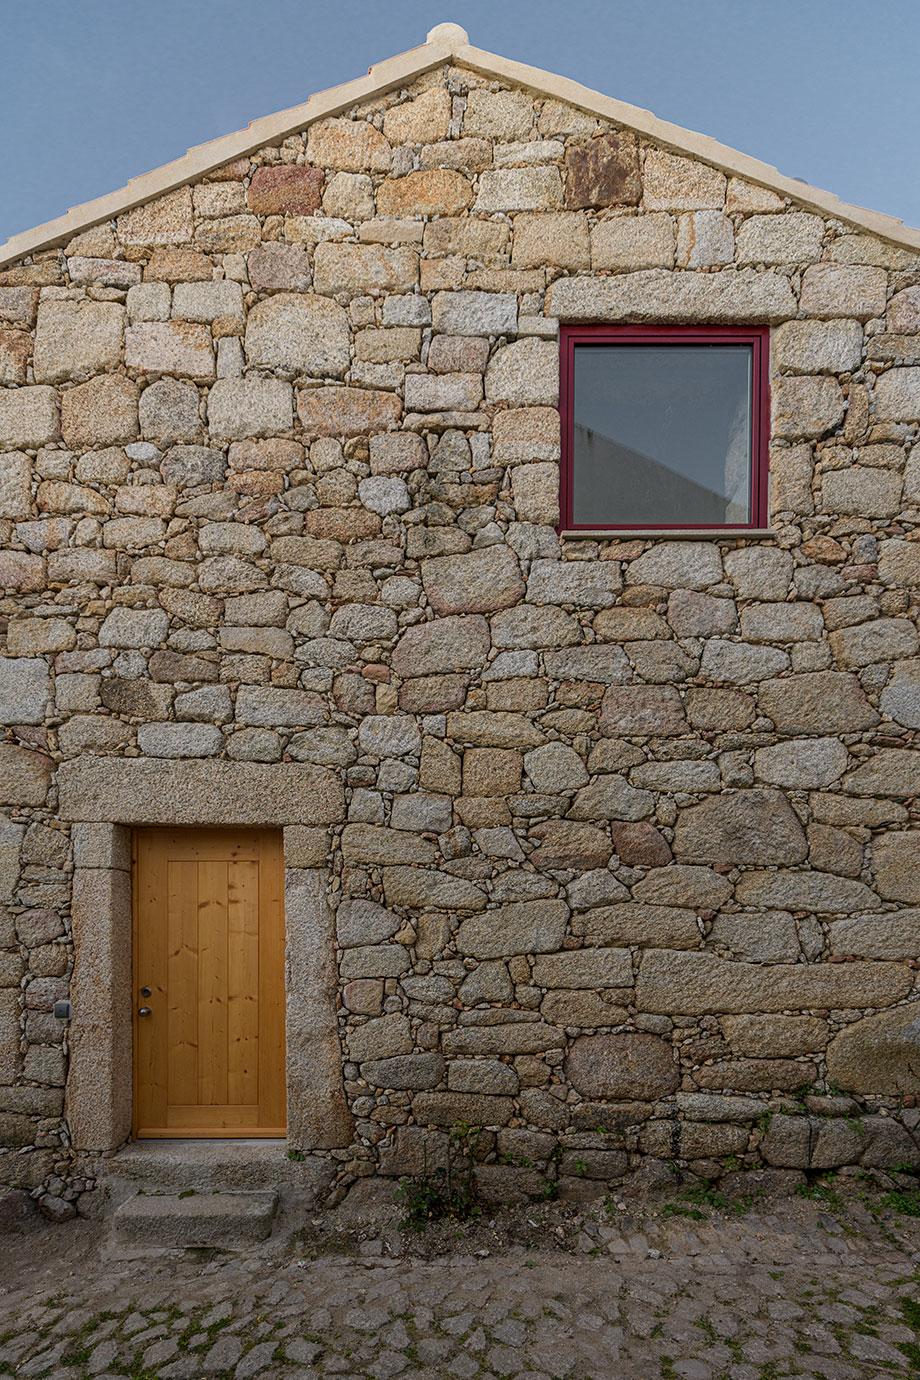 casa rural en portugal de hbg architects (18) - foto ricardo oliveira alves